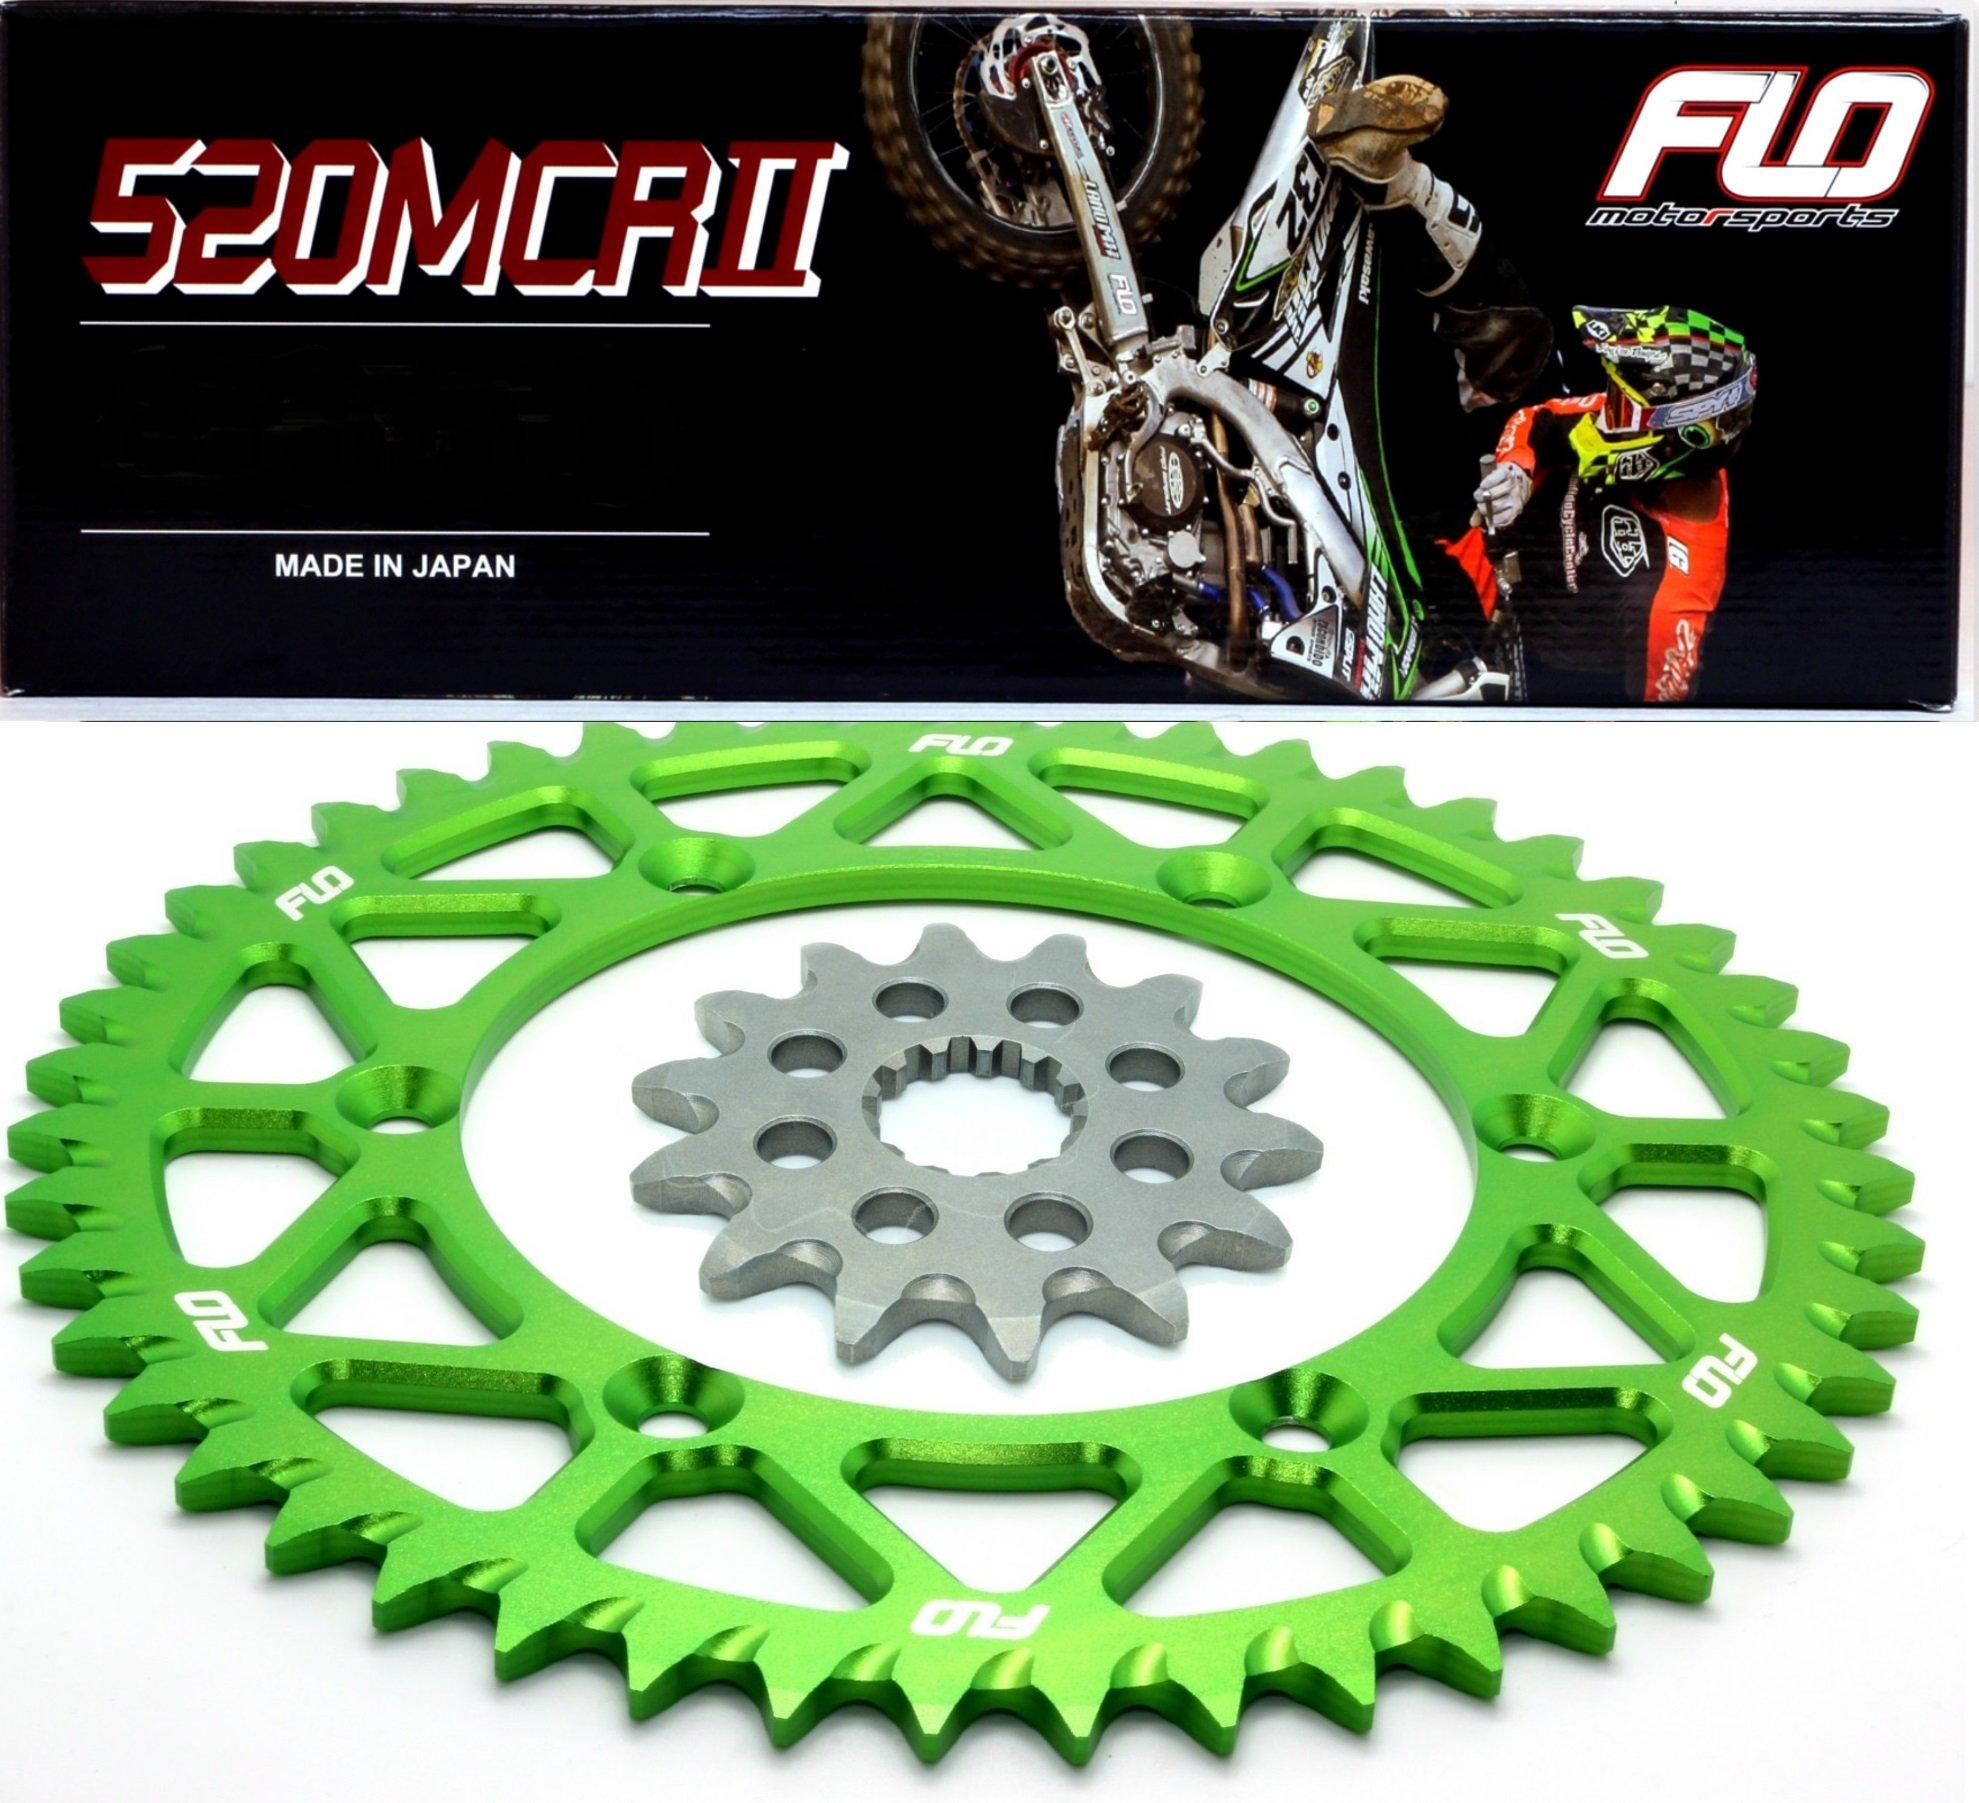 Flo Motorsports Gold Chain & Sprocket Combo Kit KAWASAKI KX250F FRONT SPROCKET 13T / REAR SPROCKET 48, 50, 51, 52, or 53 TOOTH (50T, Green)